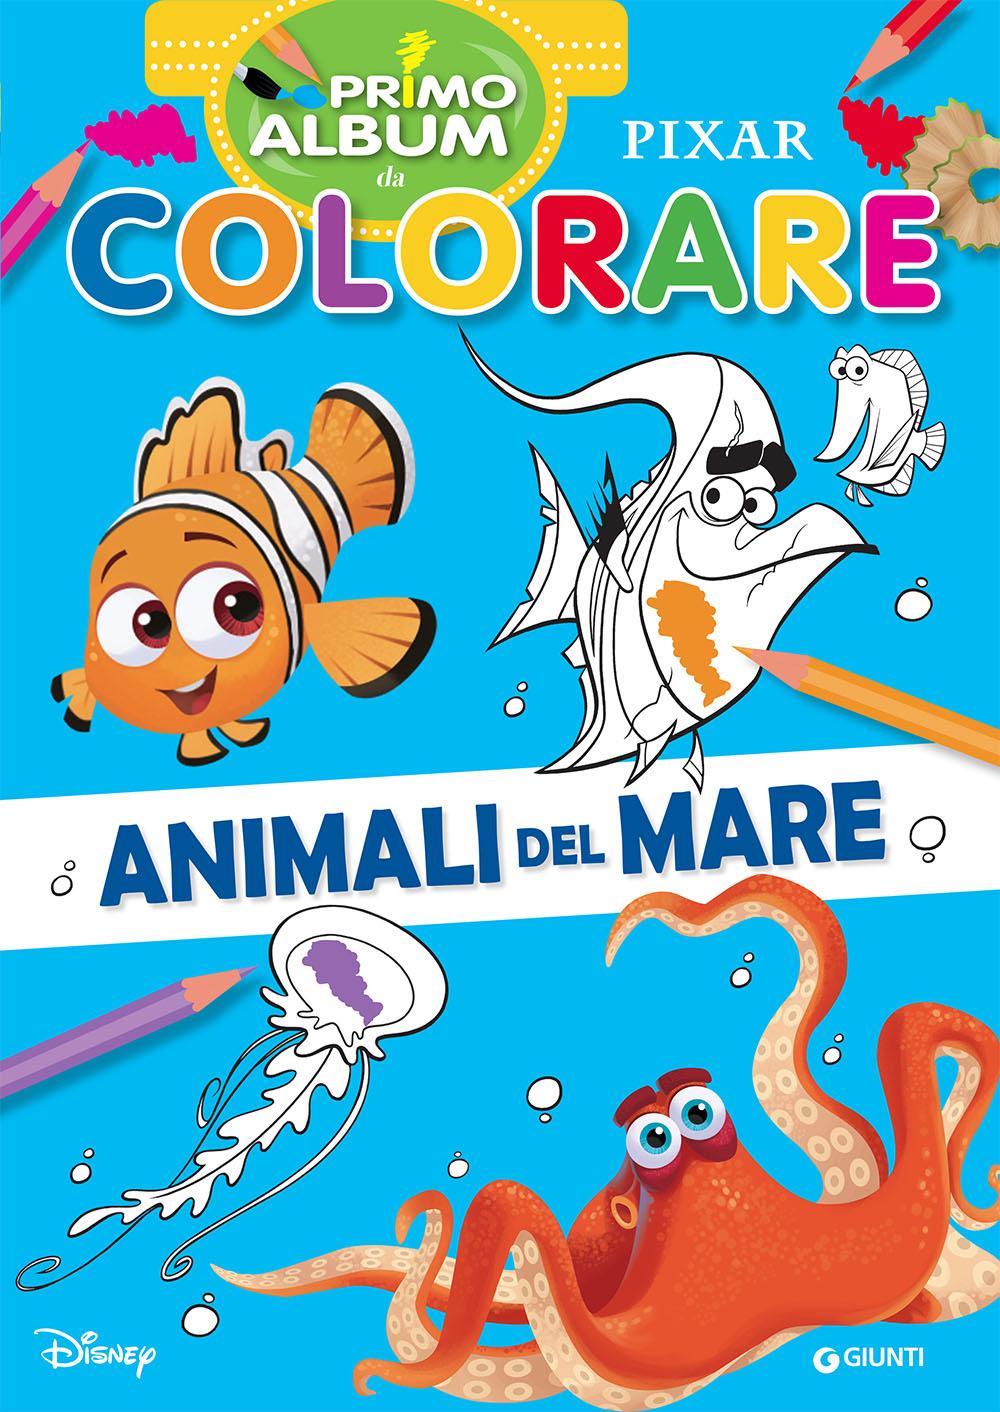 Primo album da colorare Pixar